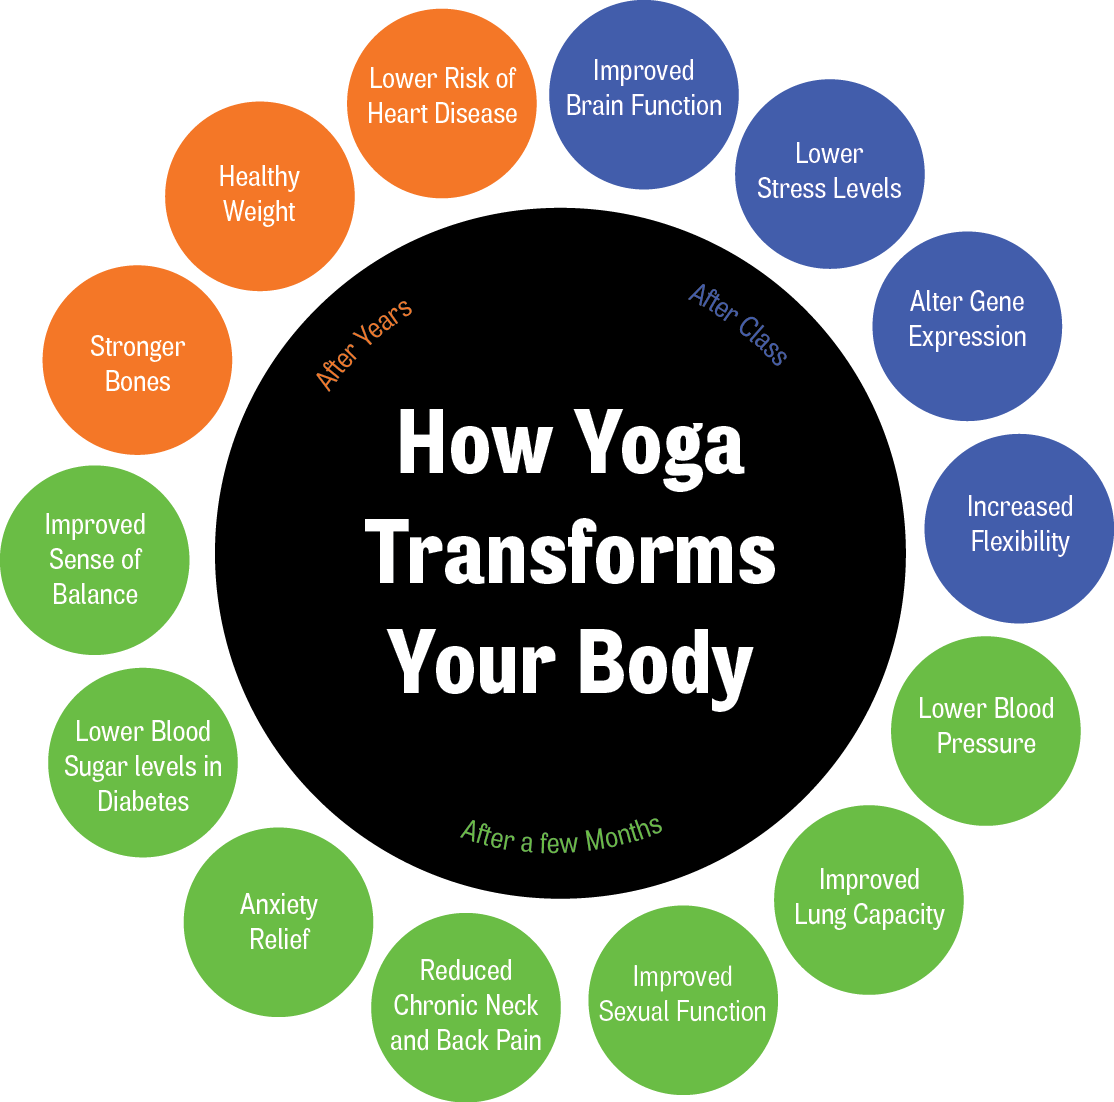 World Yoga Day 2017: Health Benefits of Yoga - Health Fundaa